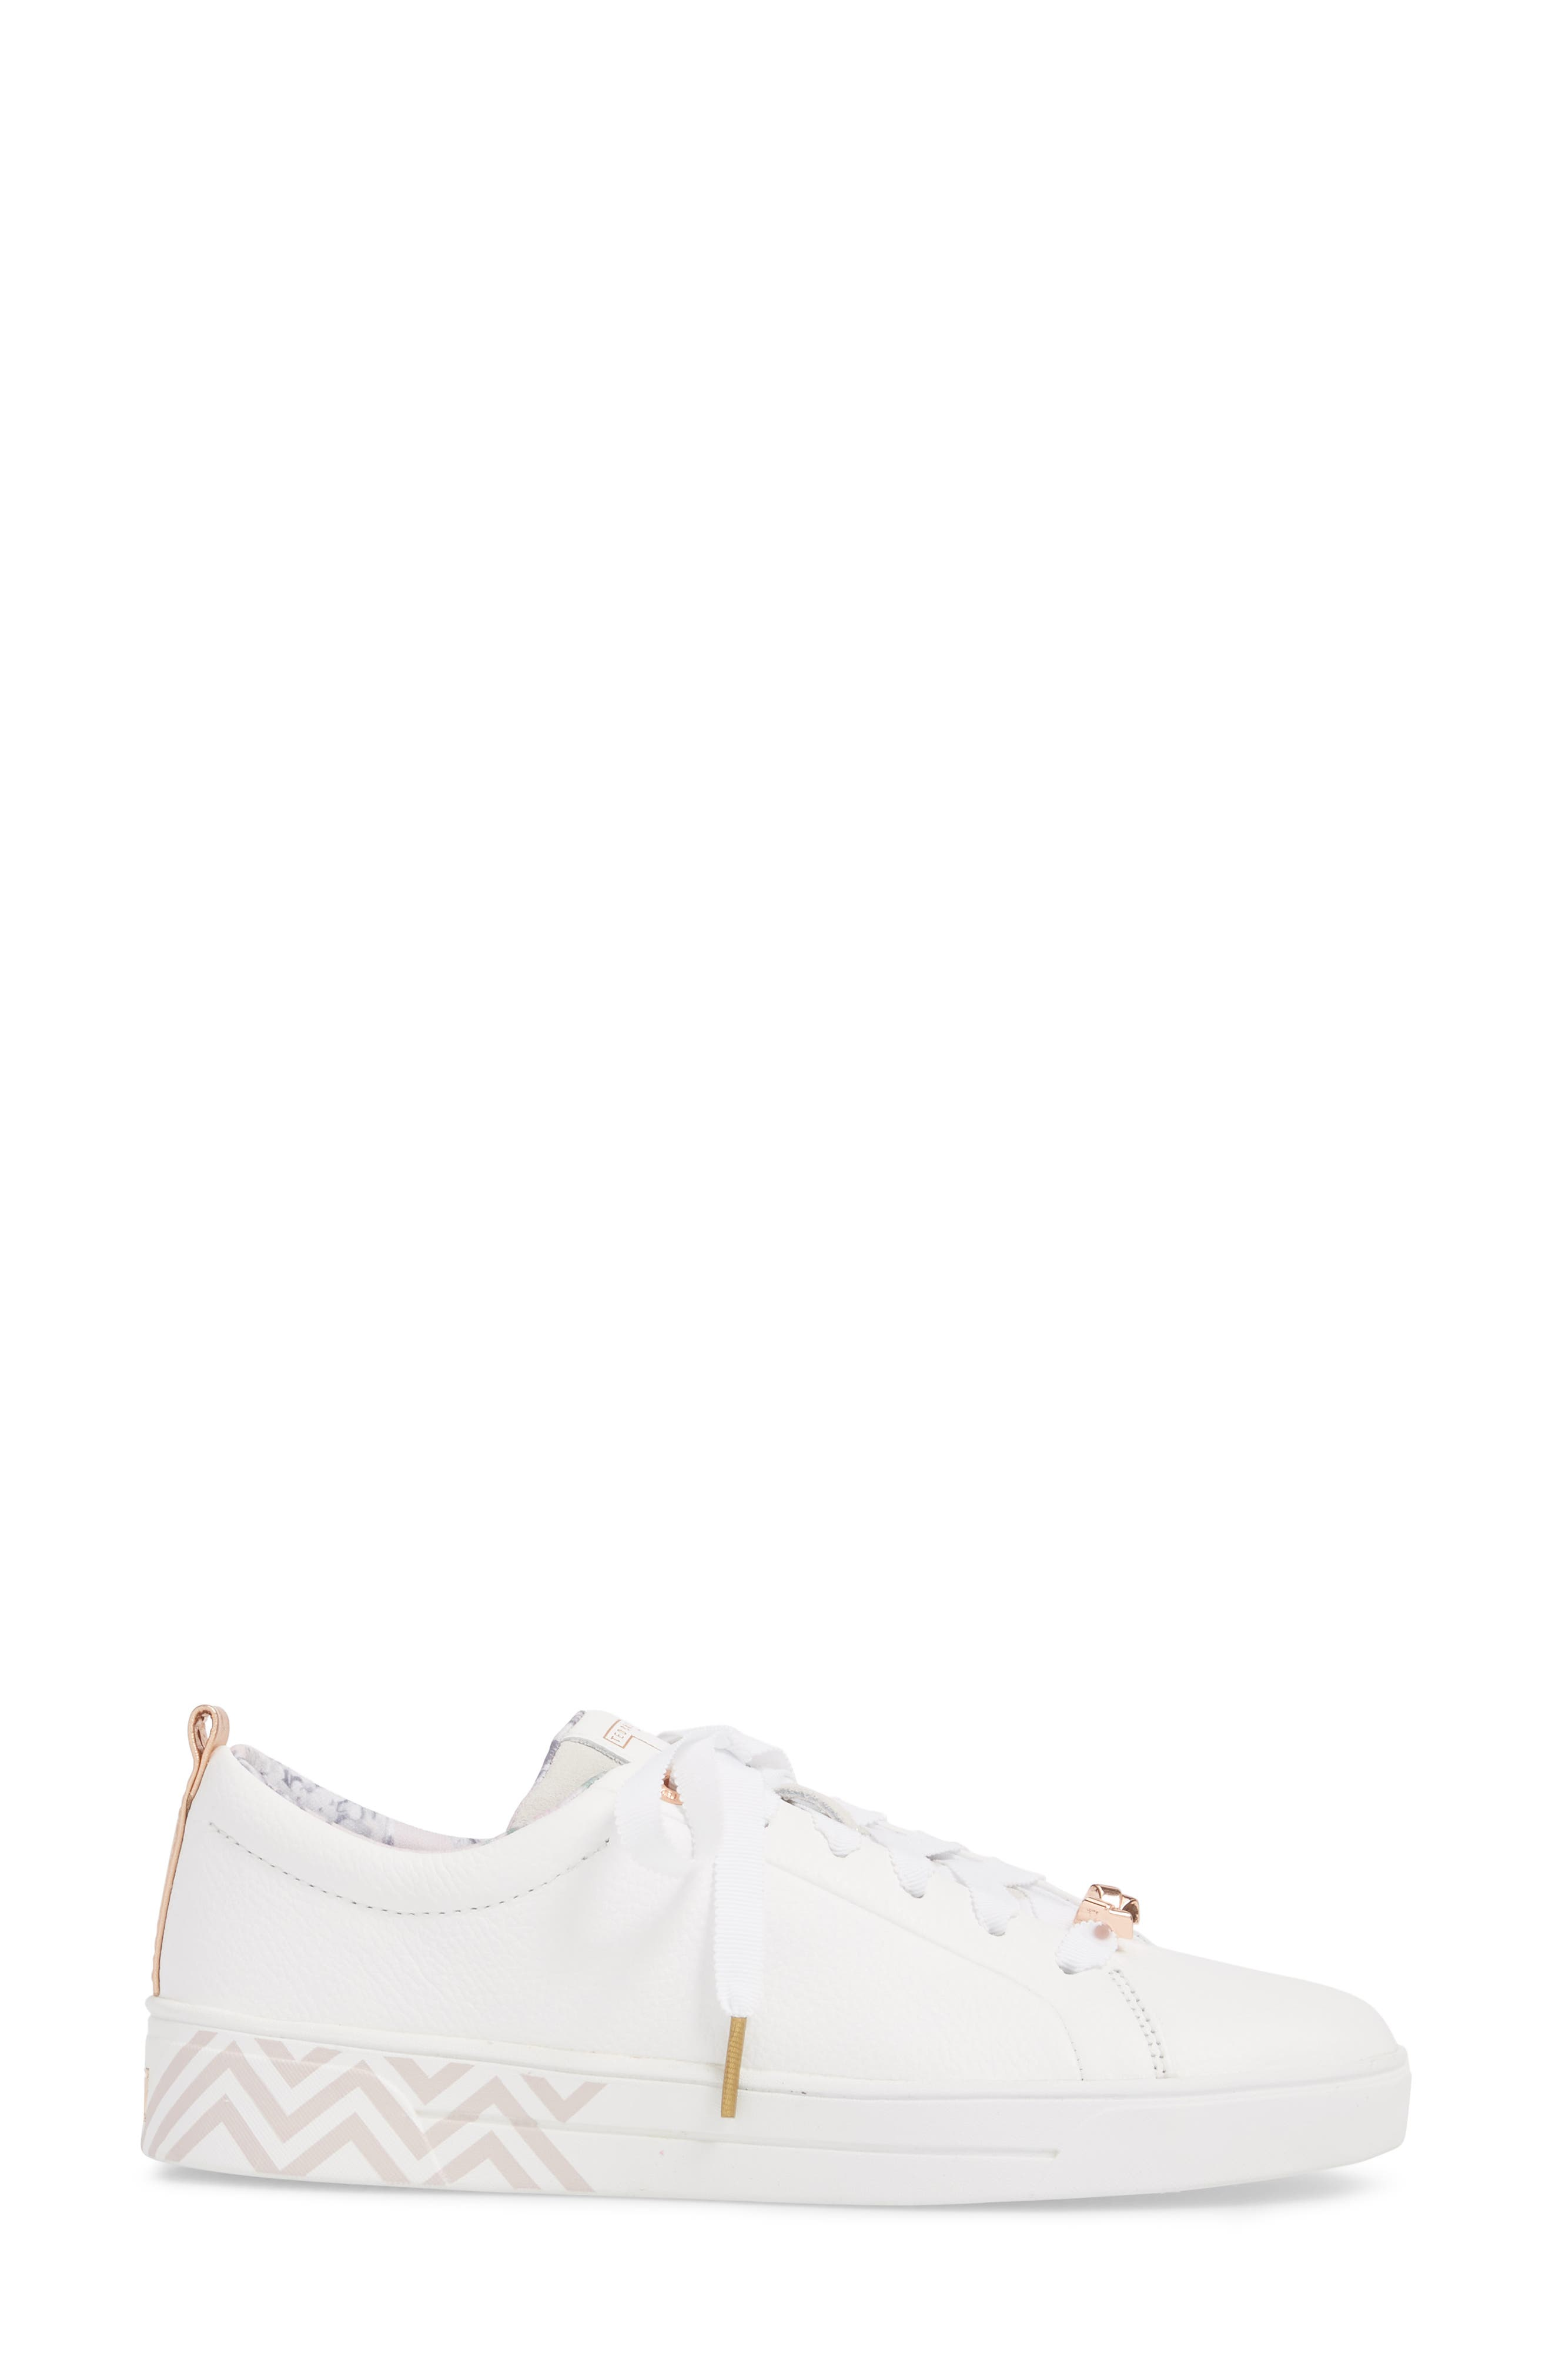 Kelleip Sneaker,                             Alternate thumbnail 3, color,                             PALACE GARDENS PRINT LEATHER